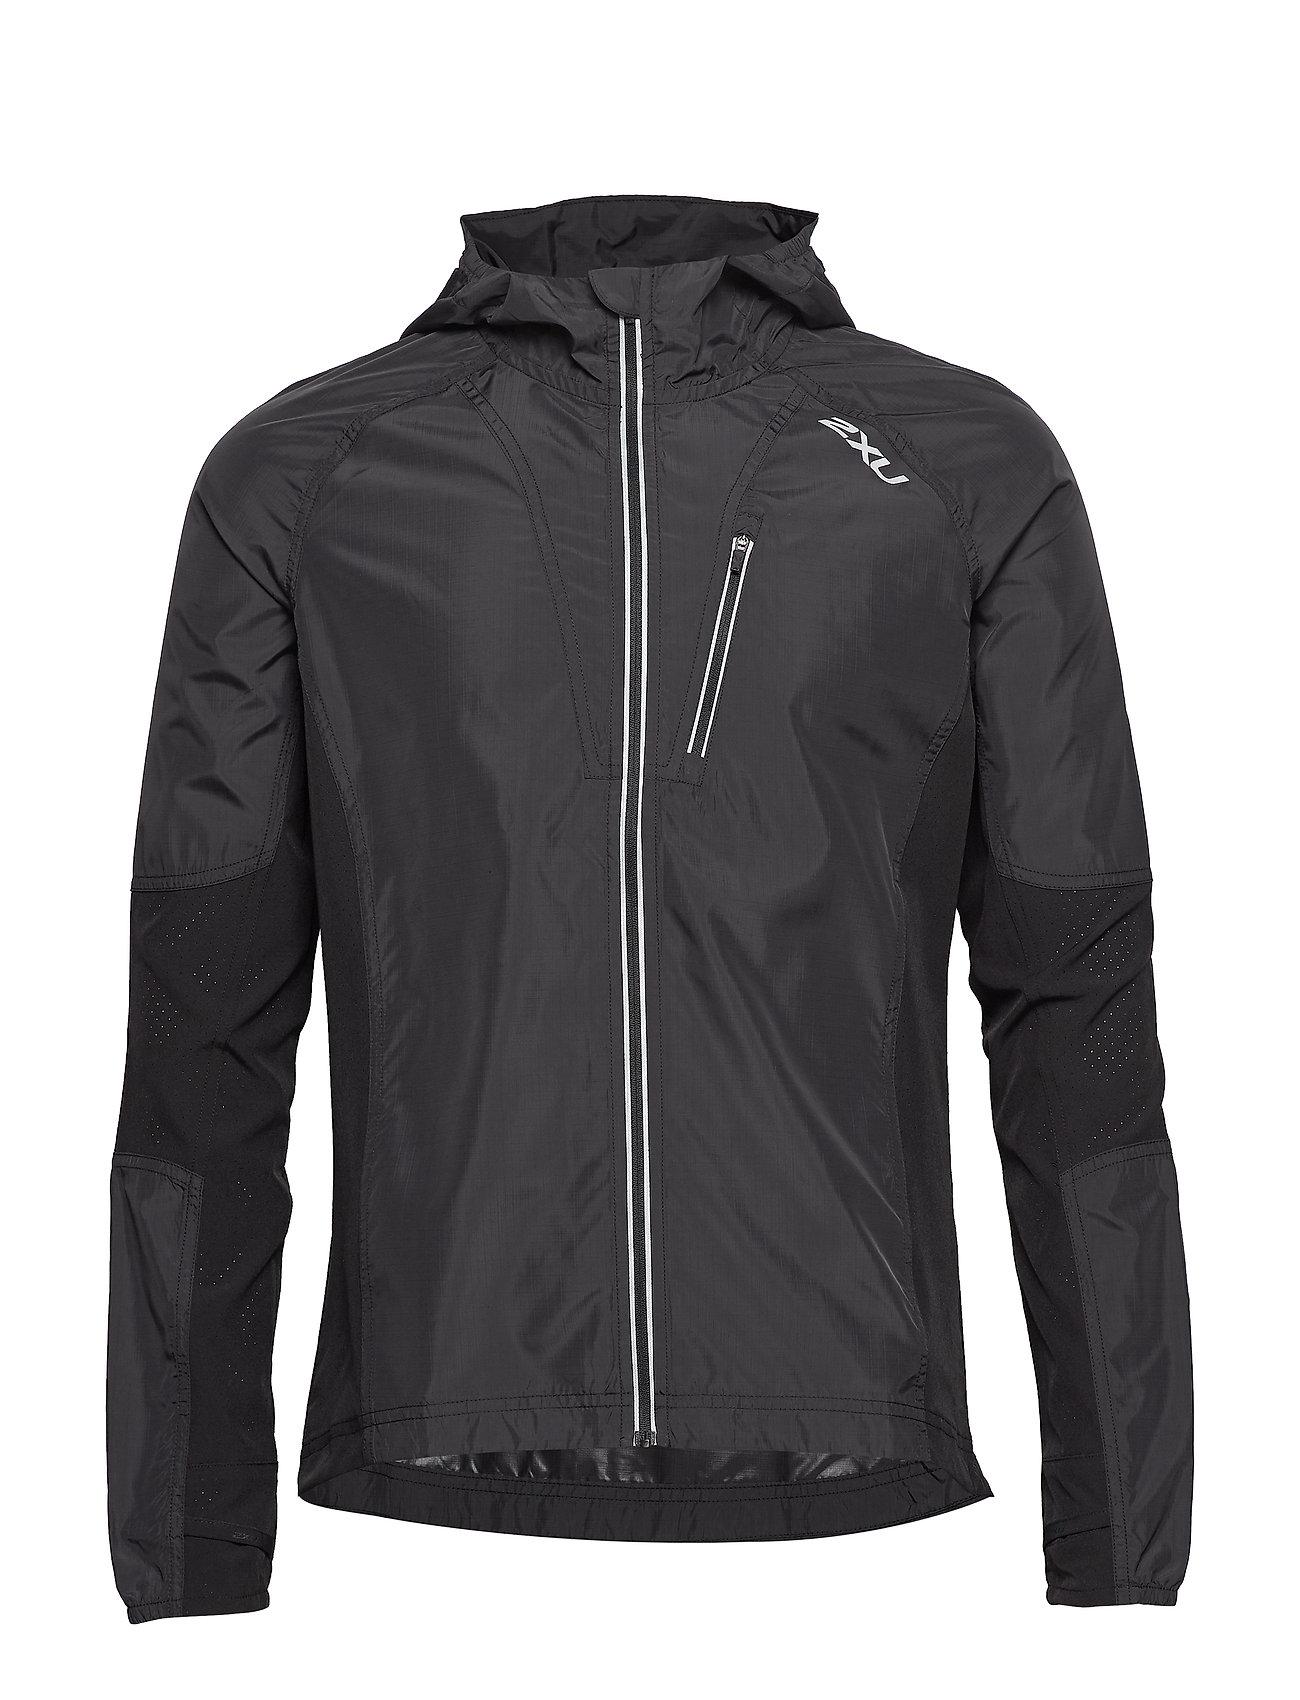 2XU XVENT Jacket - BLACK/BLACK